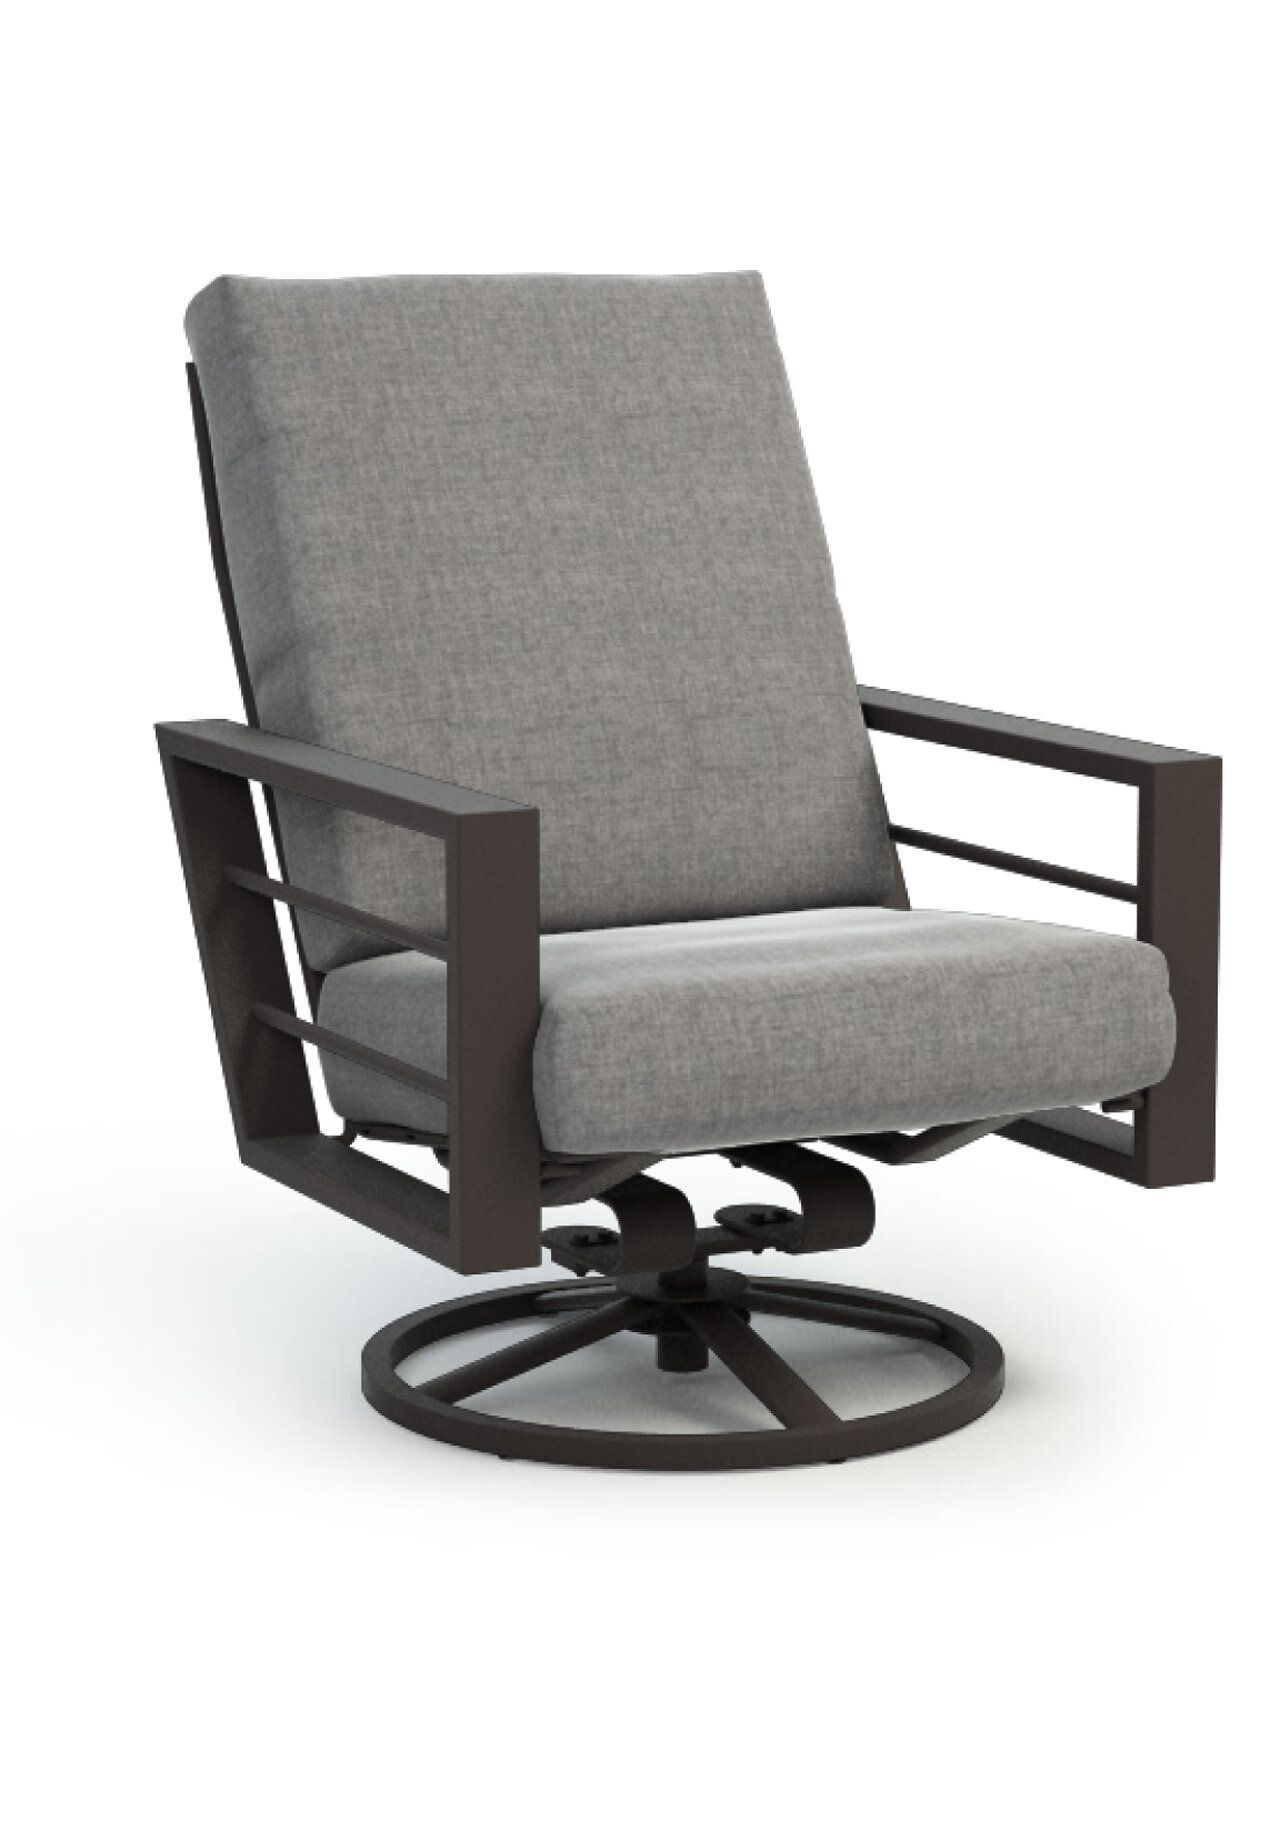 Brayden Studio Niles High Back Rocker Chat Swivel Patio Chair With Sunbrella Cushions In 2021 Outdoor Swivel Chair Patio Chairs Swivel Rocker Chair High back swivel rocker patio chairs